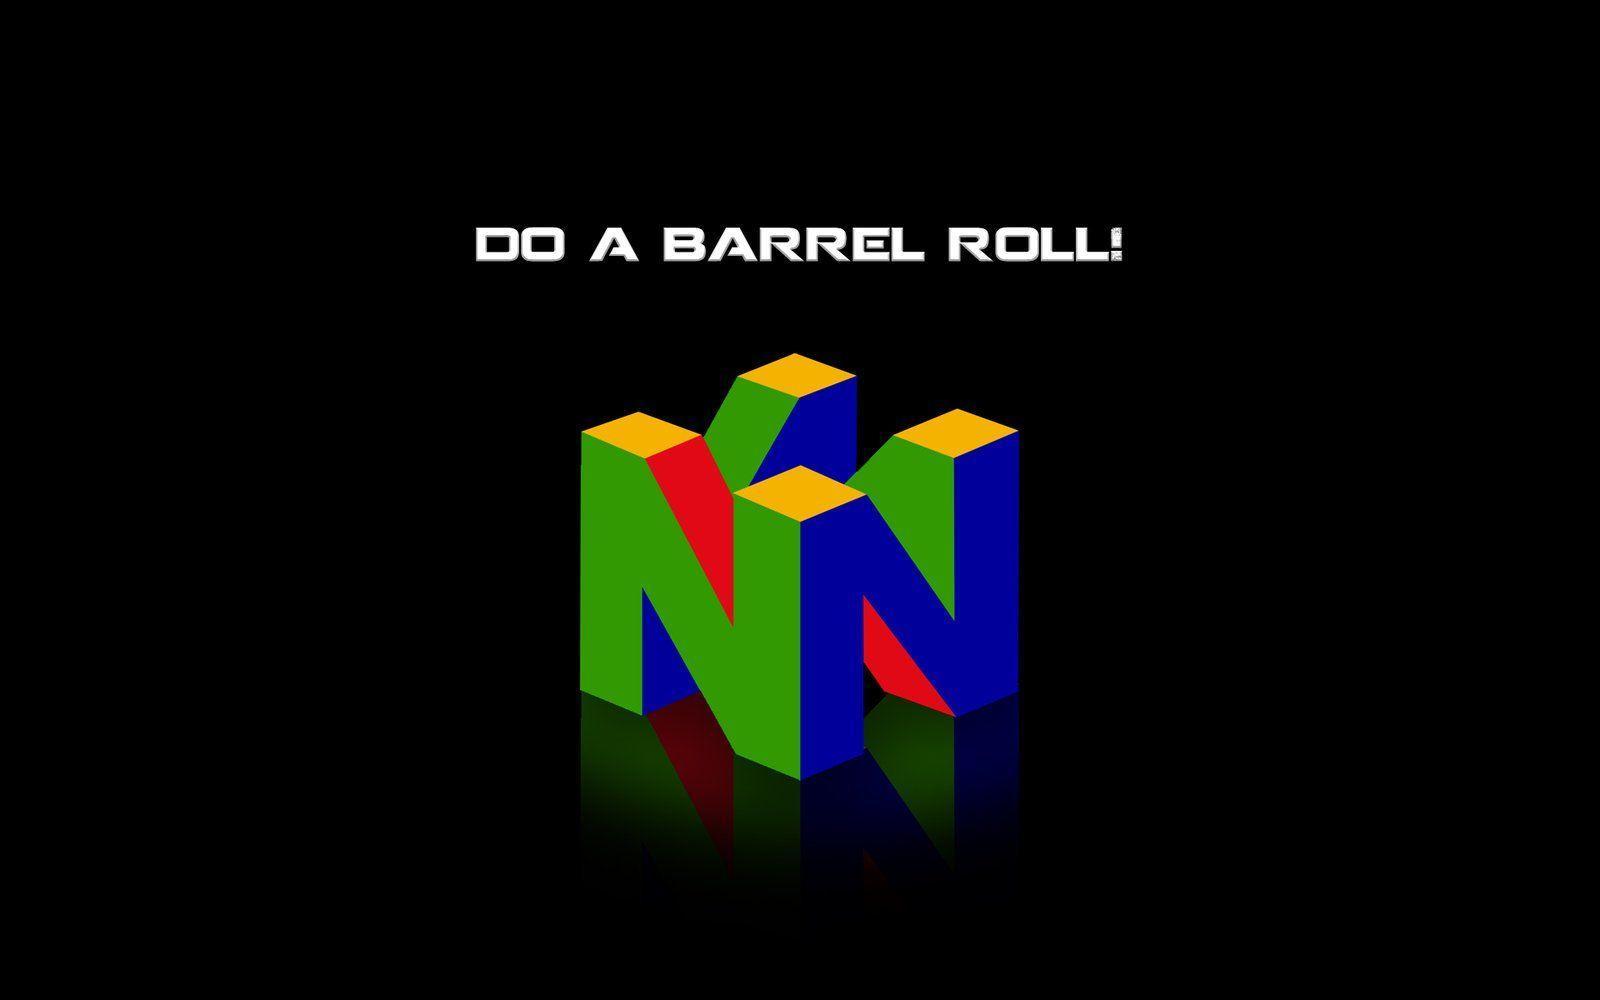 n64 logo hd wallpaper - HD1600×1000